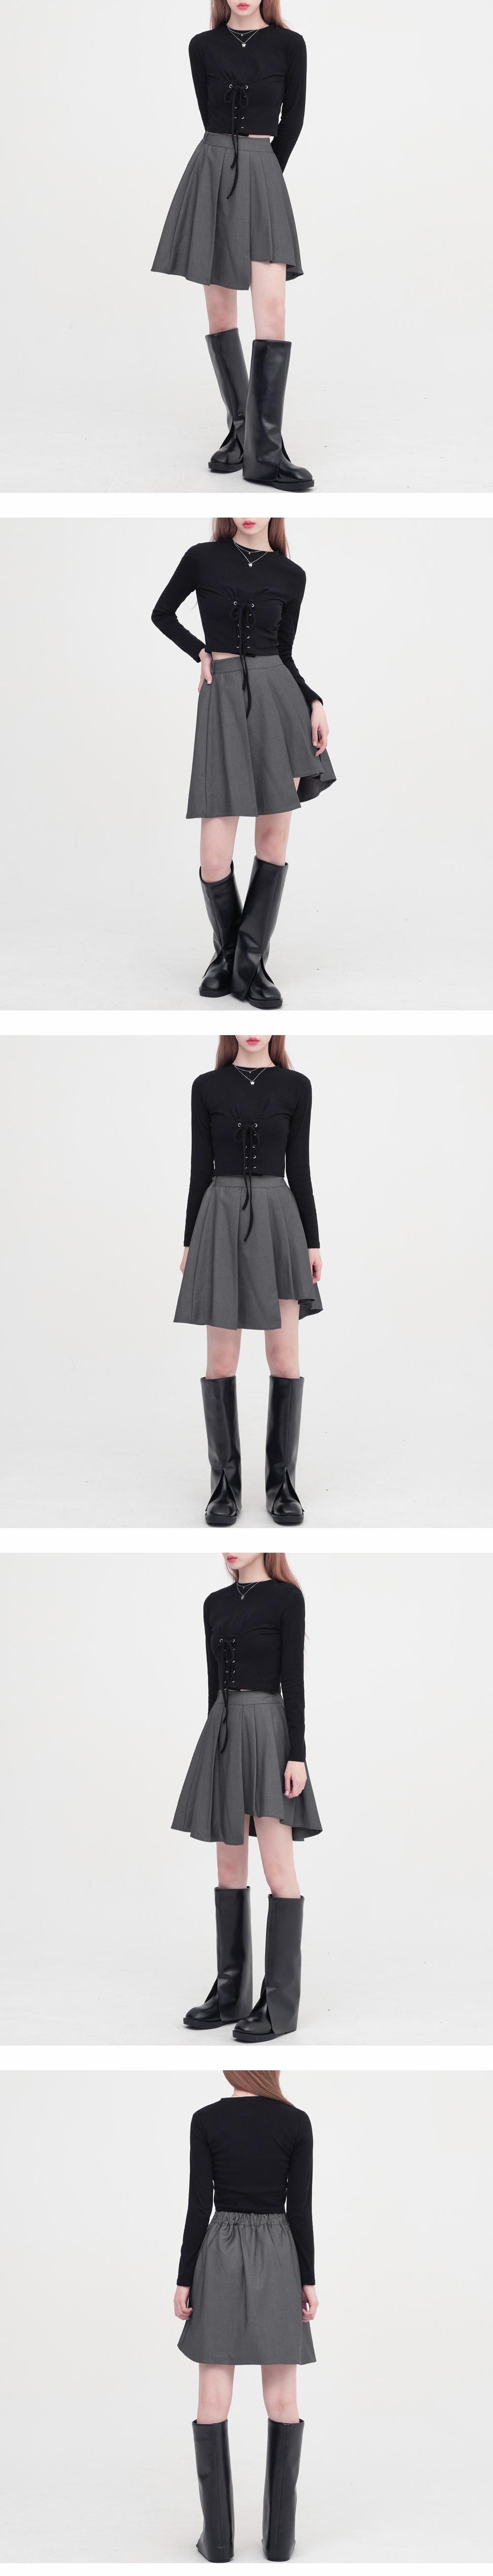 noir unbalance pleated skirt